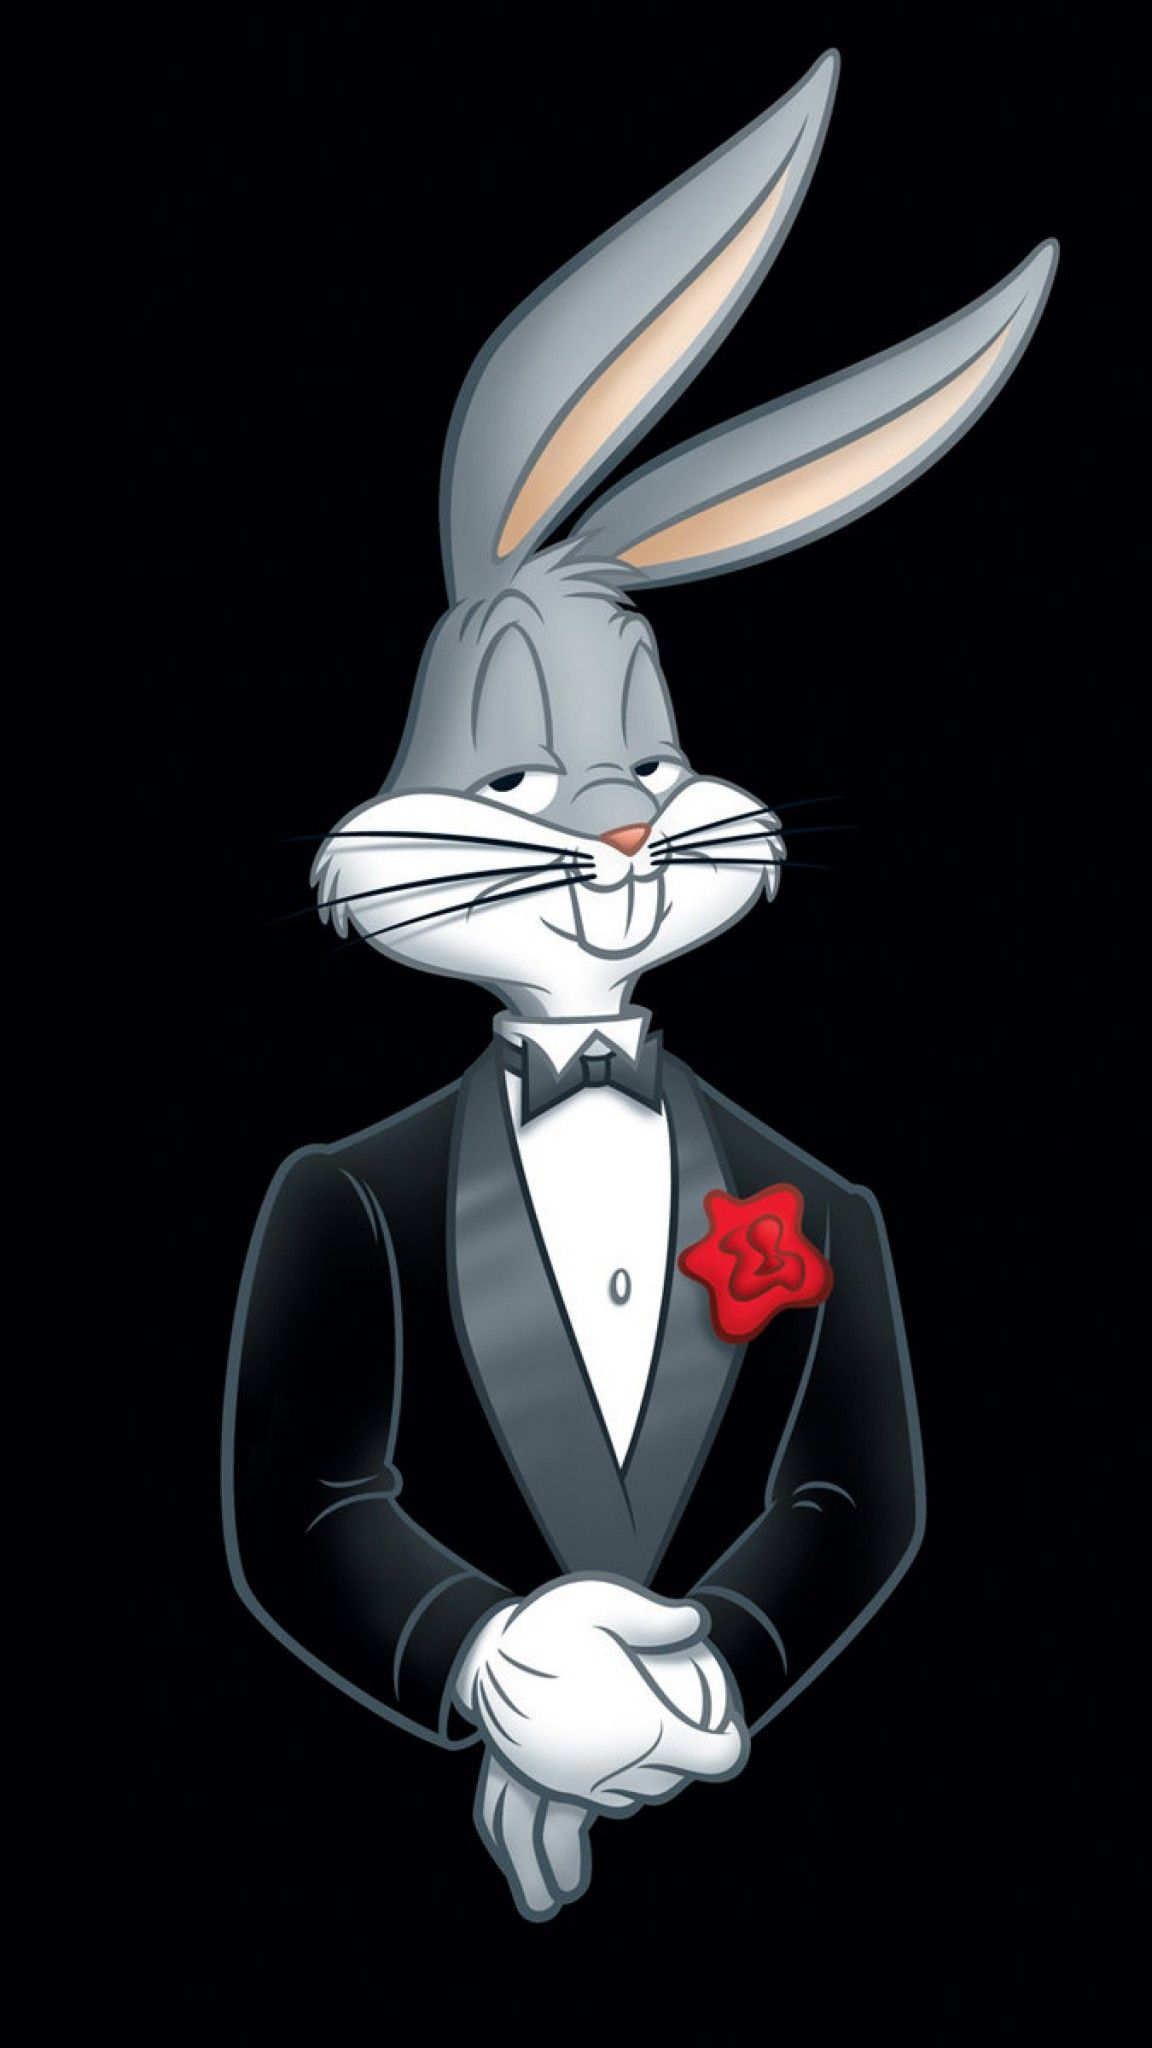 Looney Tunes, Bugs Bunny, Rabbit, Tuxedo, Flower 4K, Sony